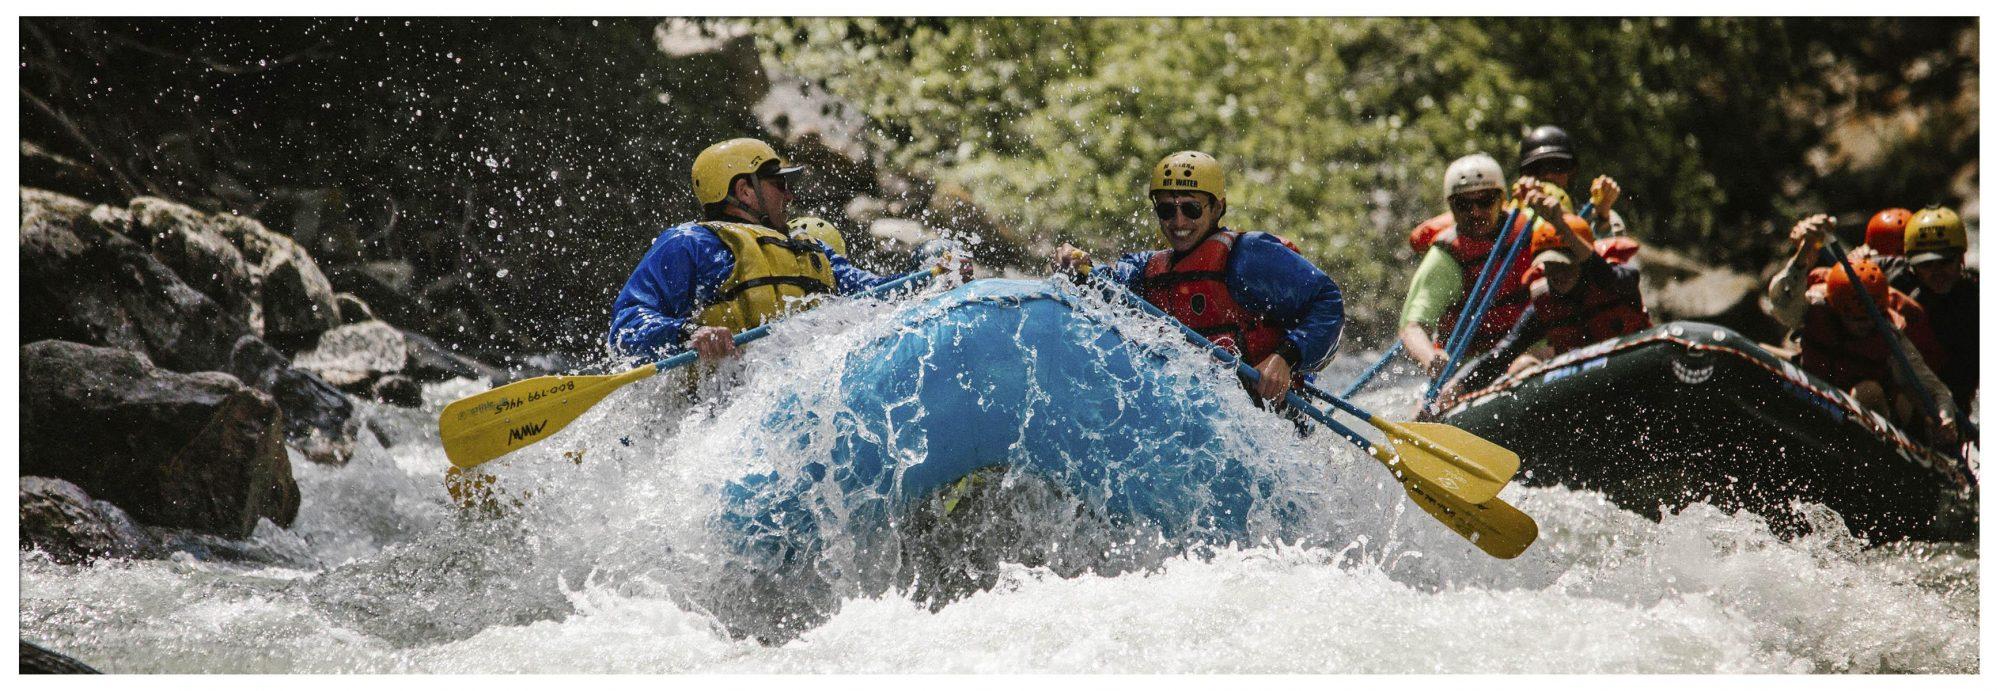 HA rafting 4 c